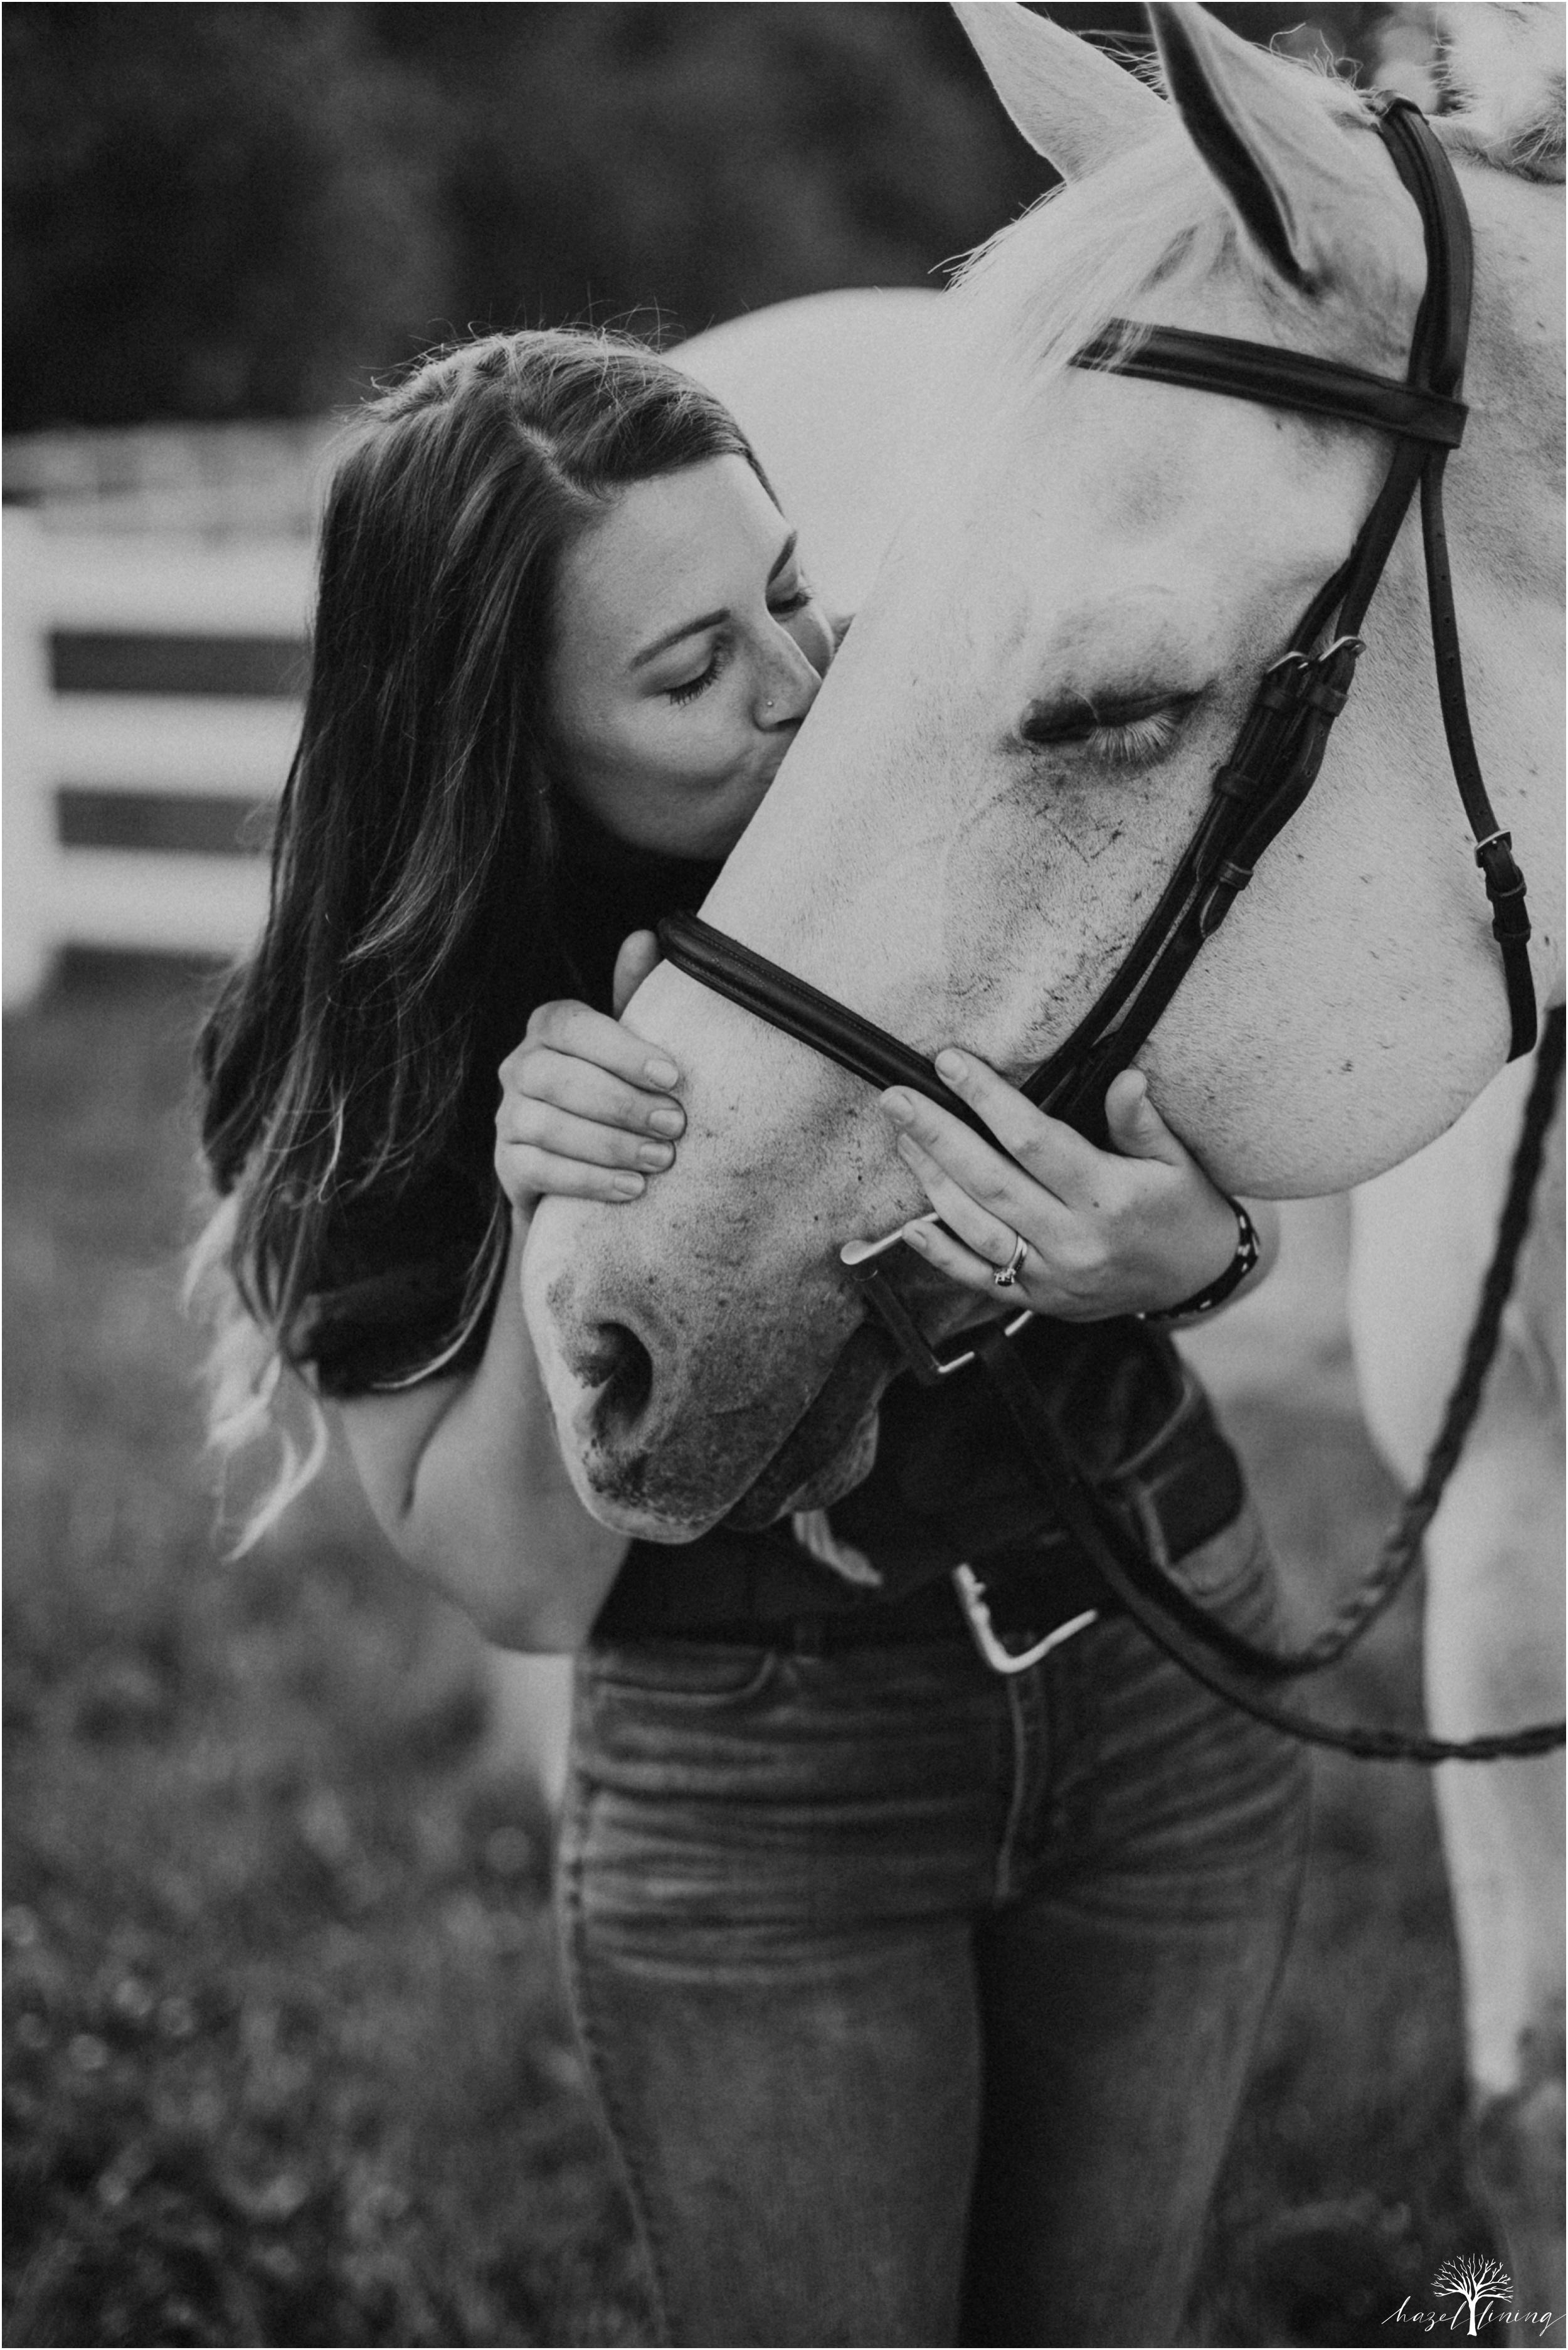 taylor-adams-and-horse-delaware-valley-university-delval-summer-equestrian-portrait-session-hazel-lining-photography-destination-elopement-wedding-engagement-photography_0011.jpg